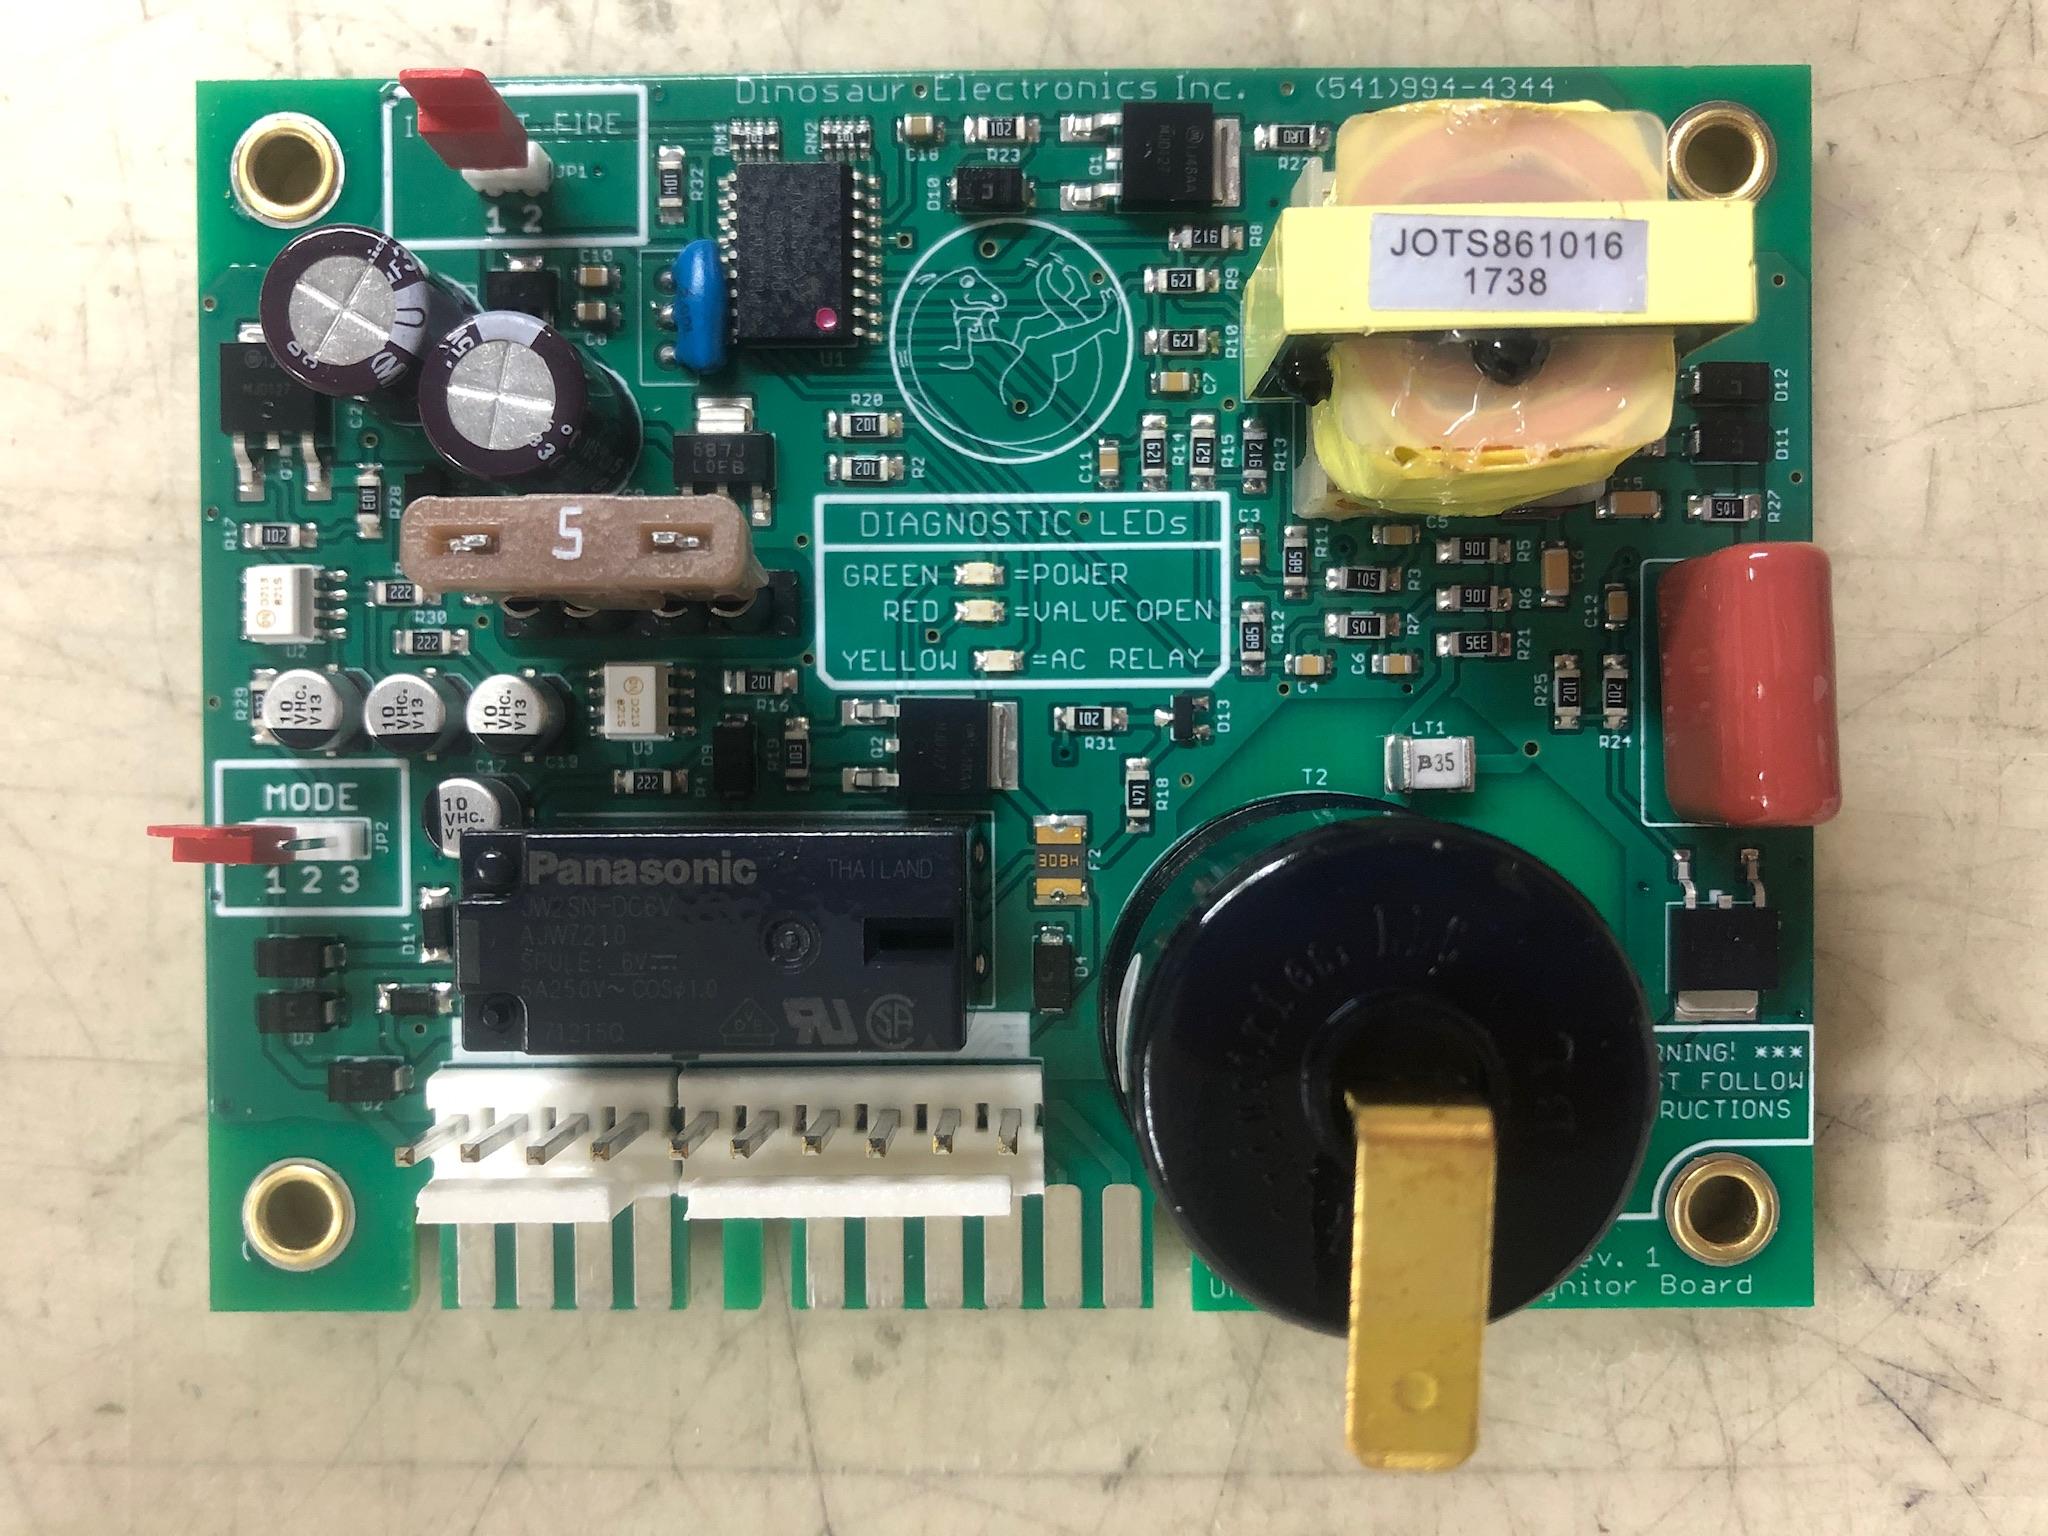 UIB64 By Dinosaur Electronics